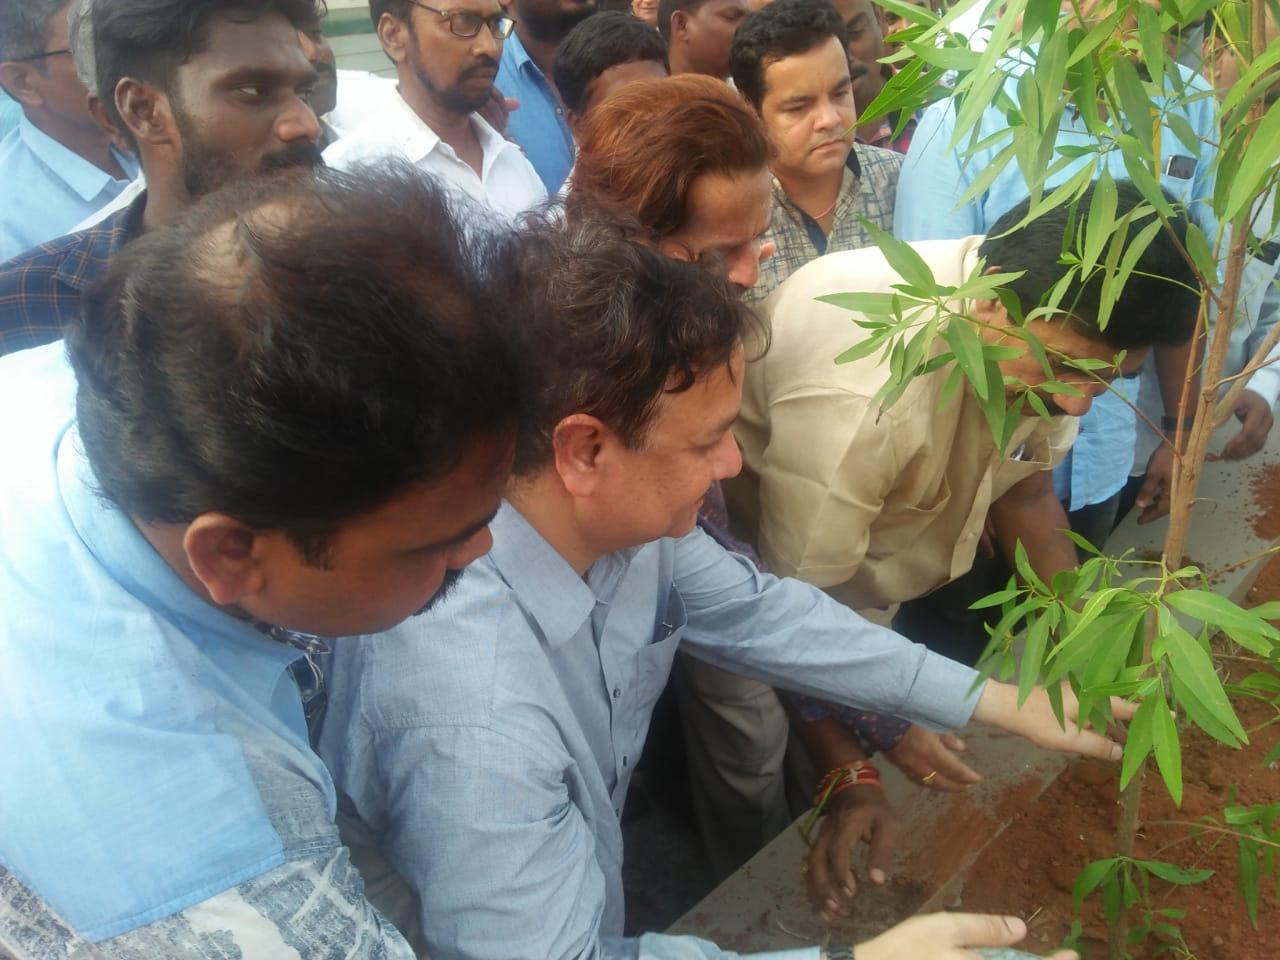 World Environment Protection Day organized by Umar Alisha Rural development Trust, Pithapuram at Main road under the Chairman ship of Peethadhipathi Dr Umar Alisha Swamy and Chief Guest Sri Pendem Dorababu, MLA and brothers of Swamy.